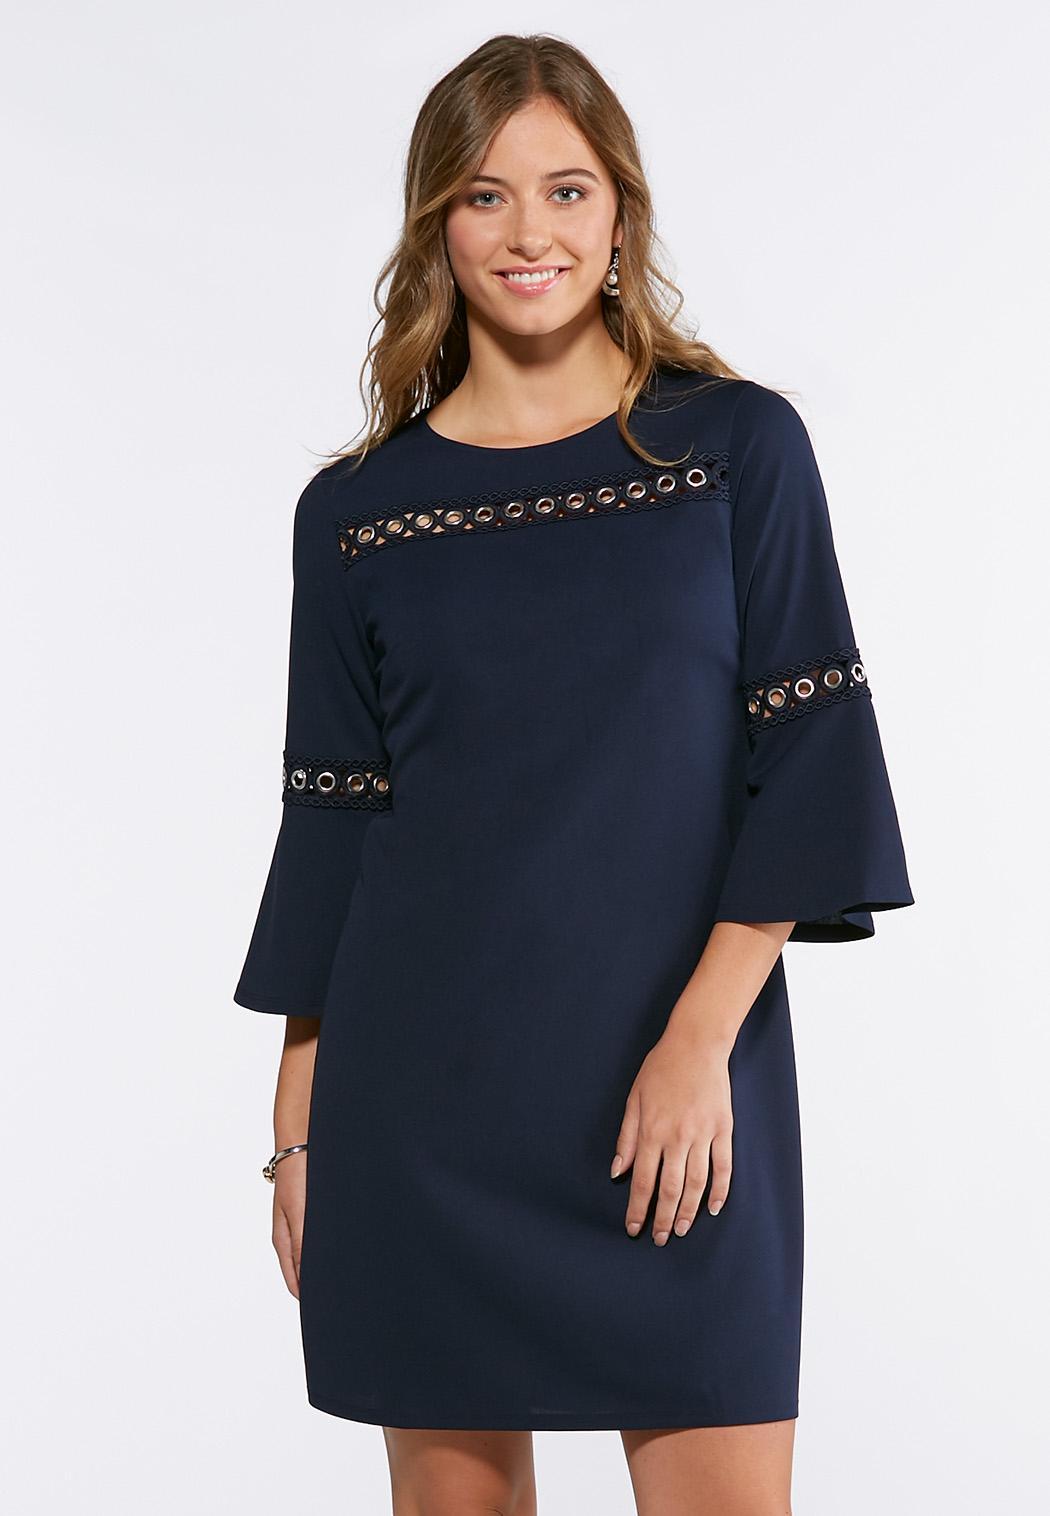 Plus Size Grommet Bell Sleeve Shift Dress Plus Sizes Cato Fashions